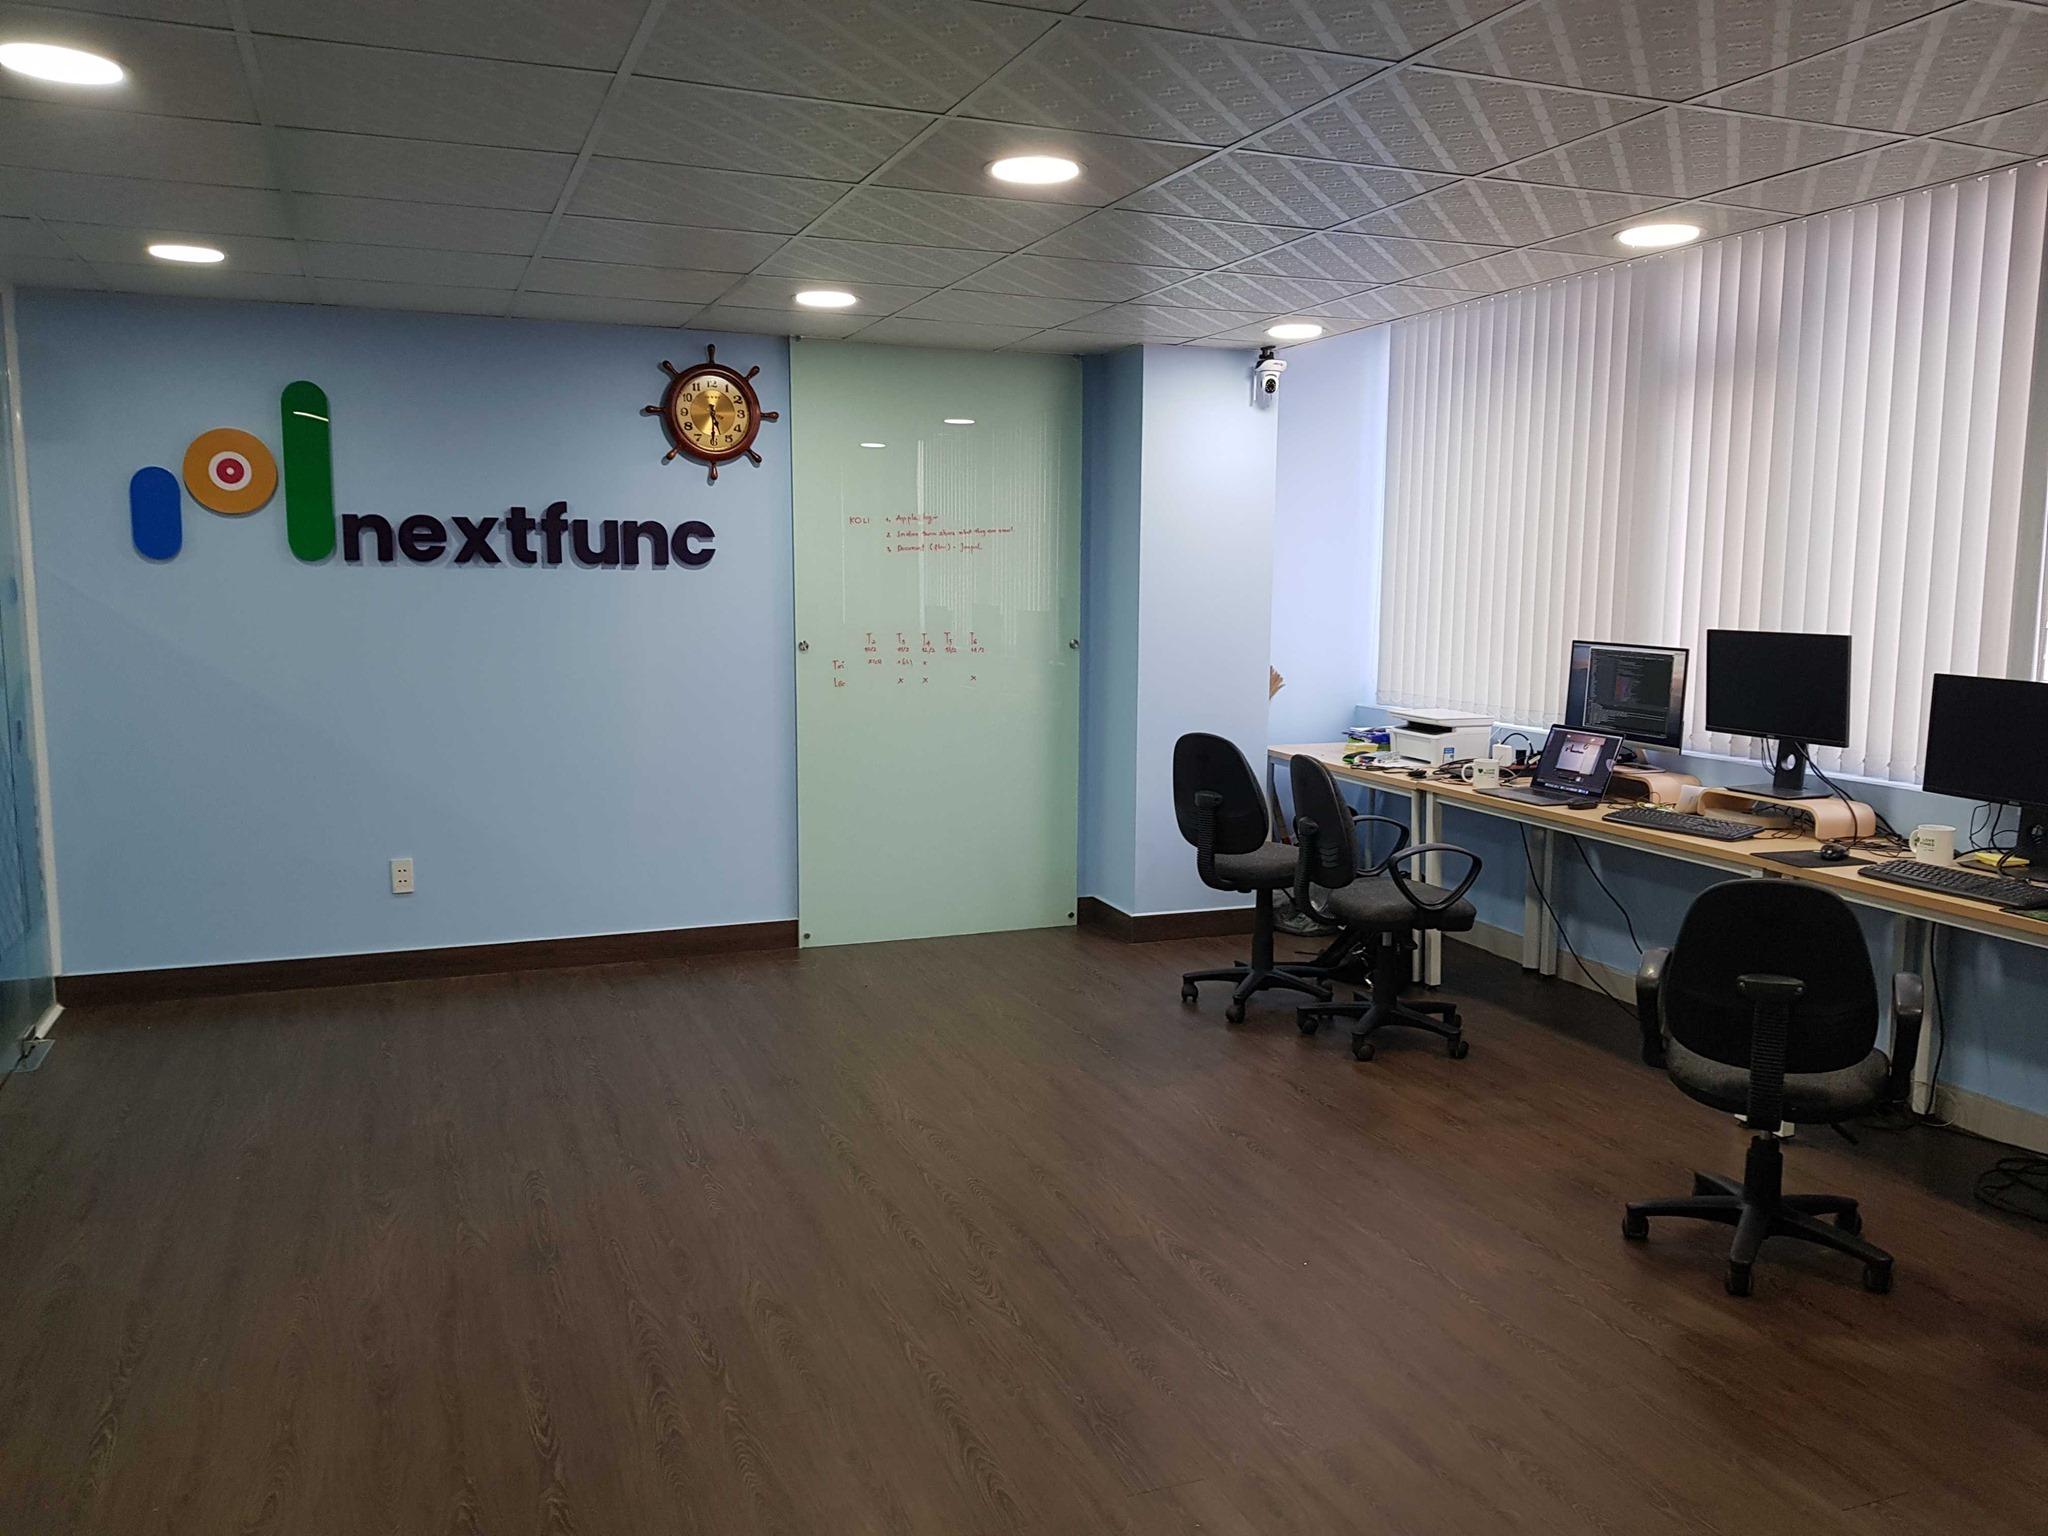 Nextfunc Co., Ltd